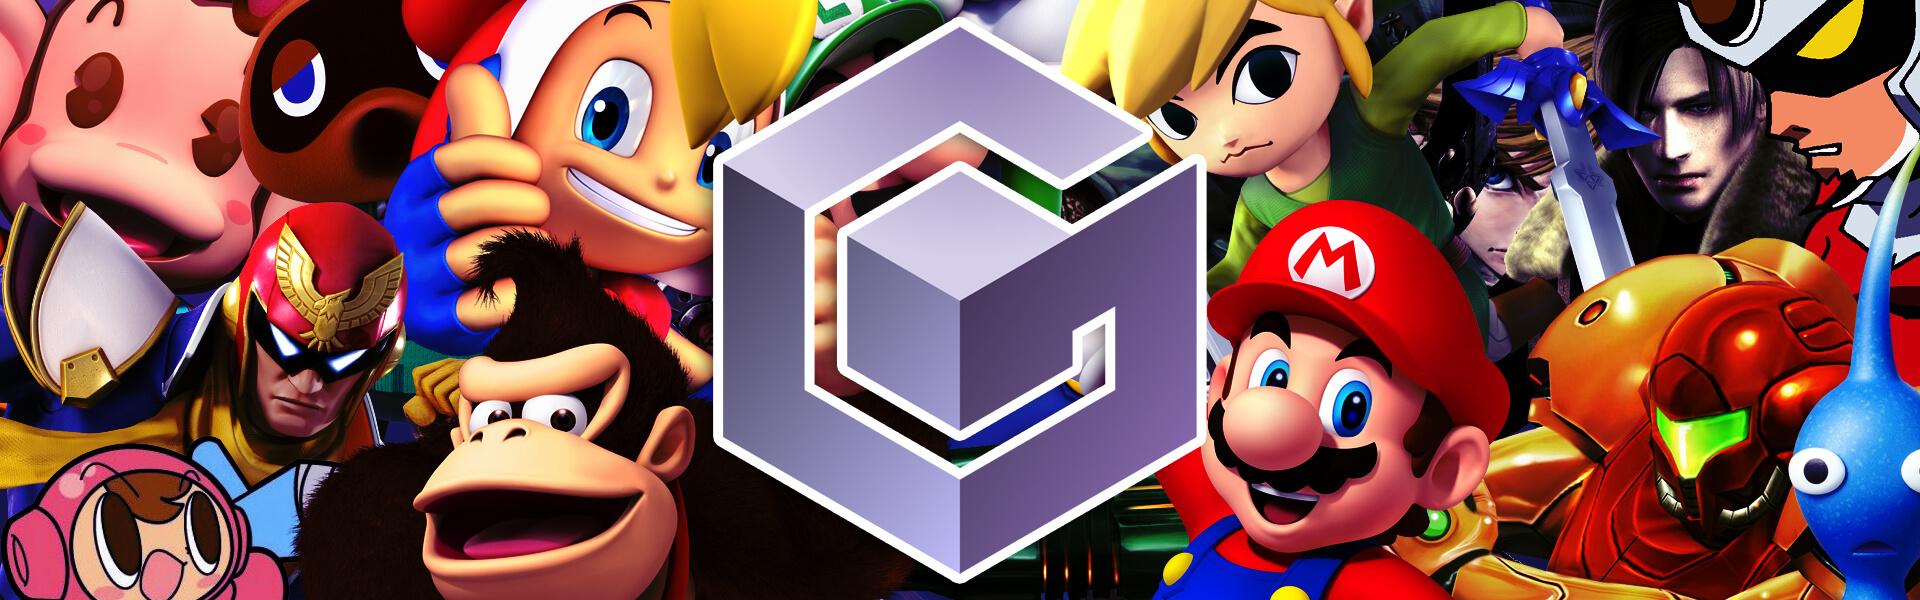 MPU_Ep27_Nintendo_GameCube_1920x600